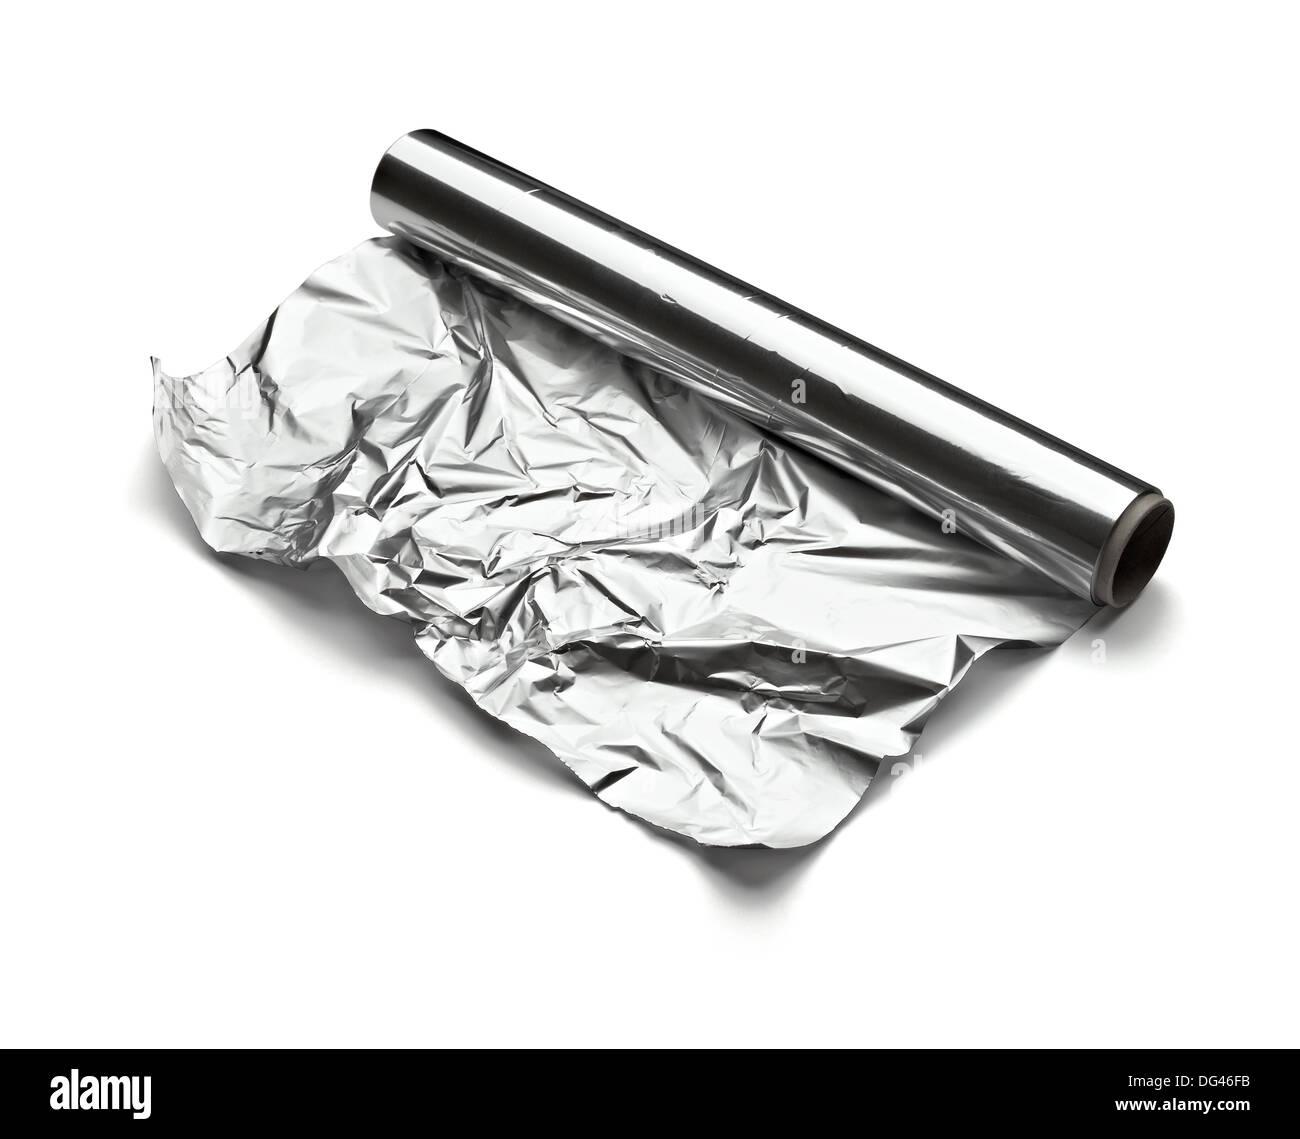 aluminum foil - Stock Image